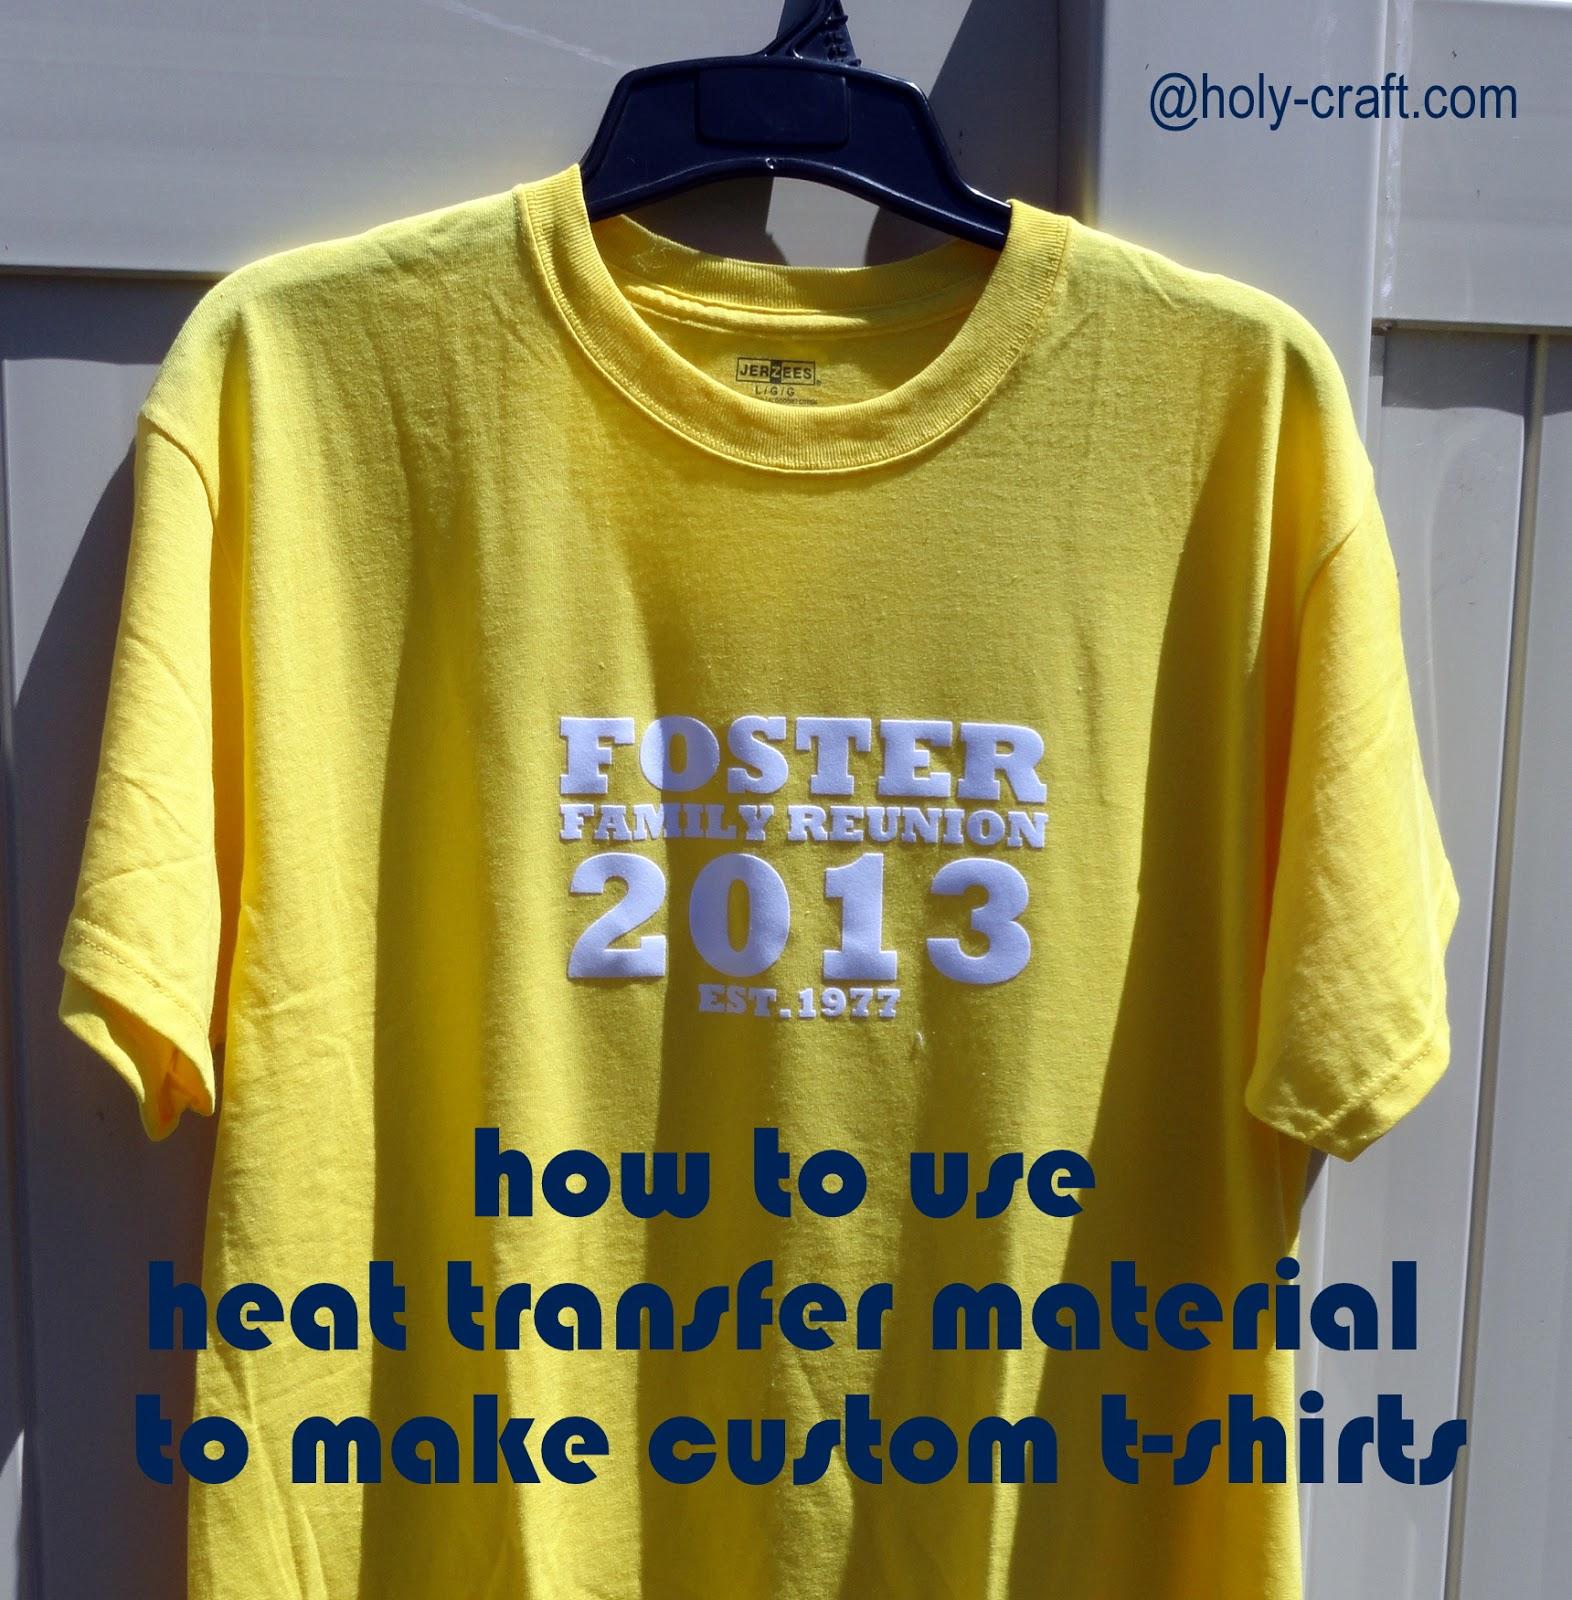 How to make custom t-shirts with heat transfer material - Rachel Teodoro